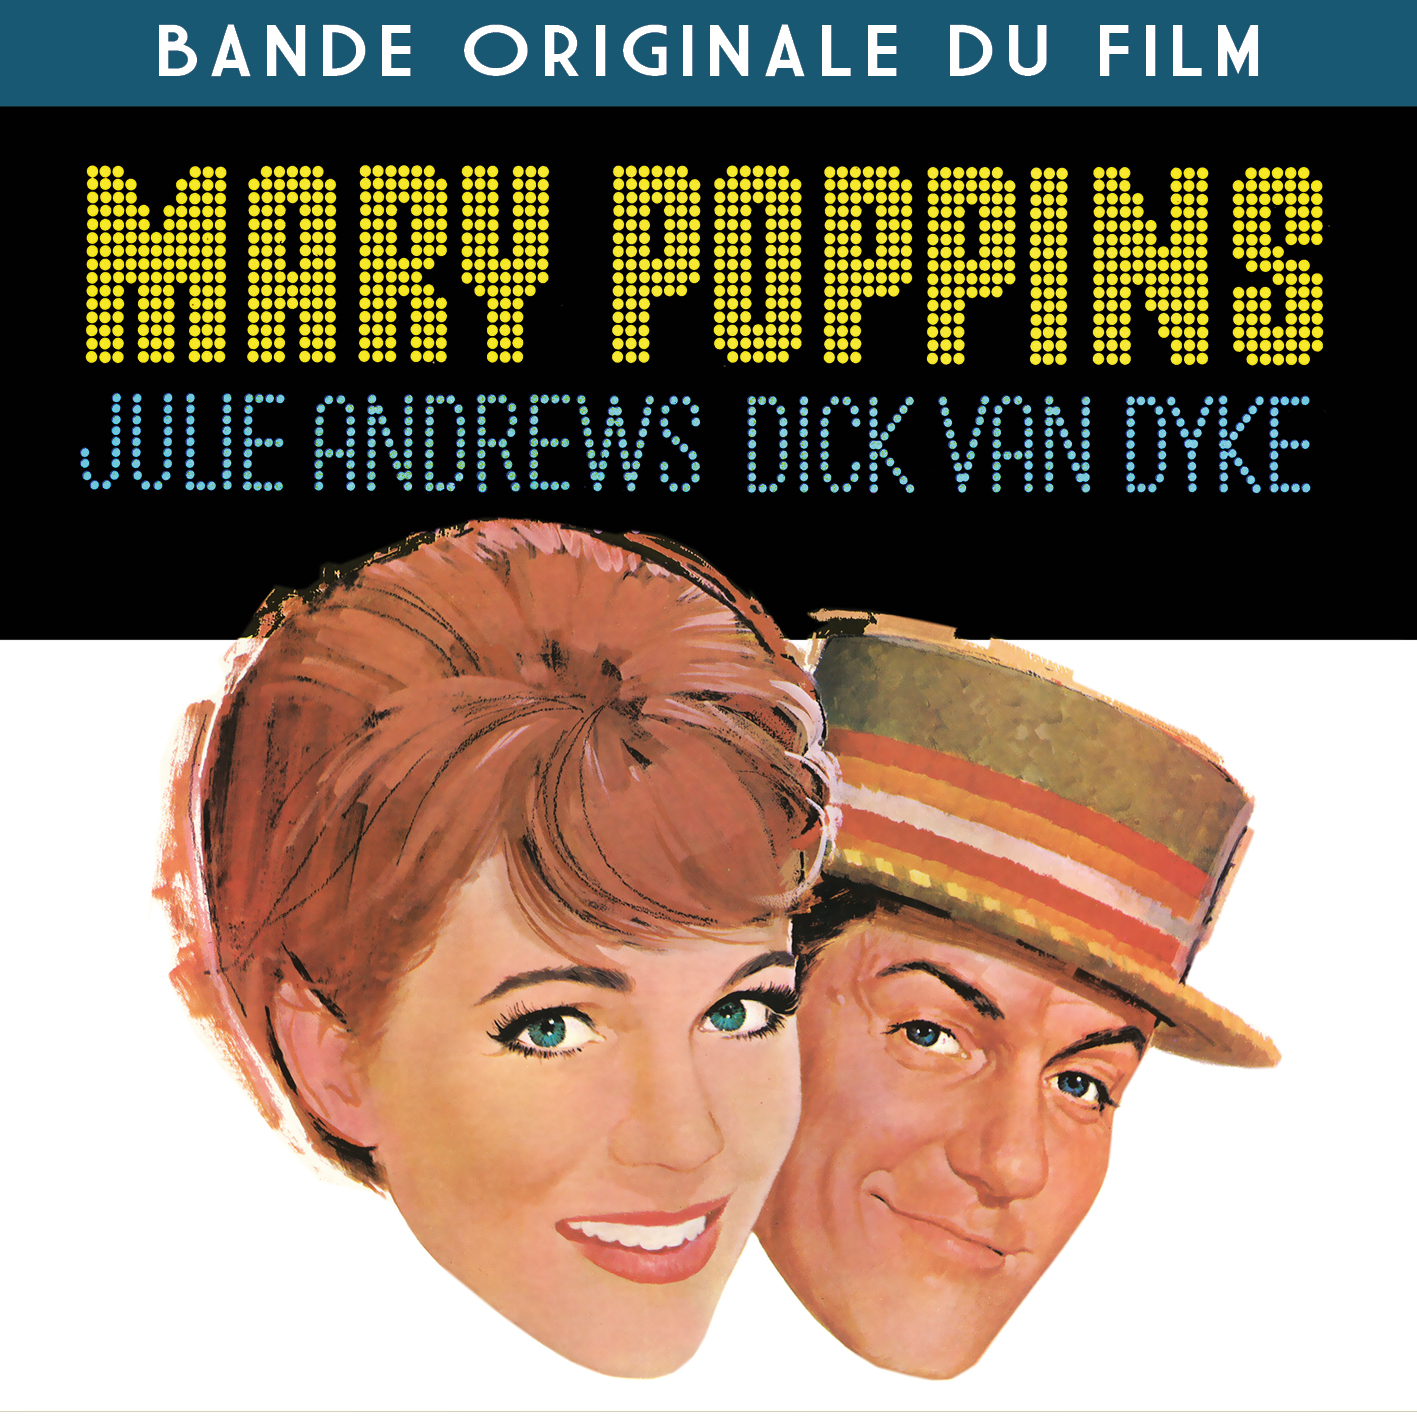 CD Mary Poppins - Bande Originale du Film (Version Anglaise & Fran�aise), de Julie Andrews, Dick Van Dyke